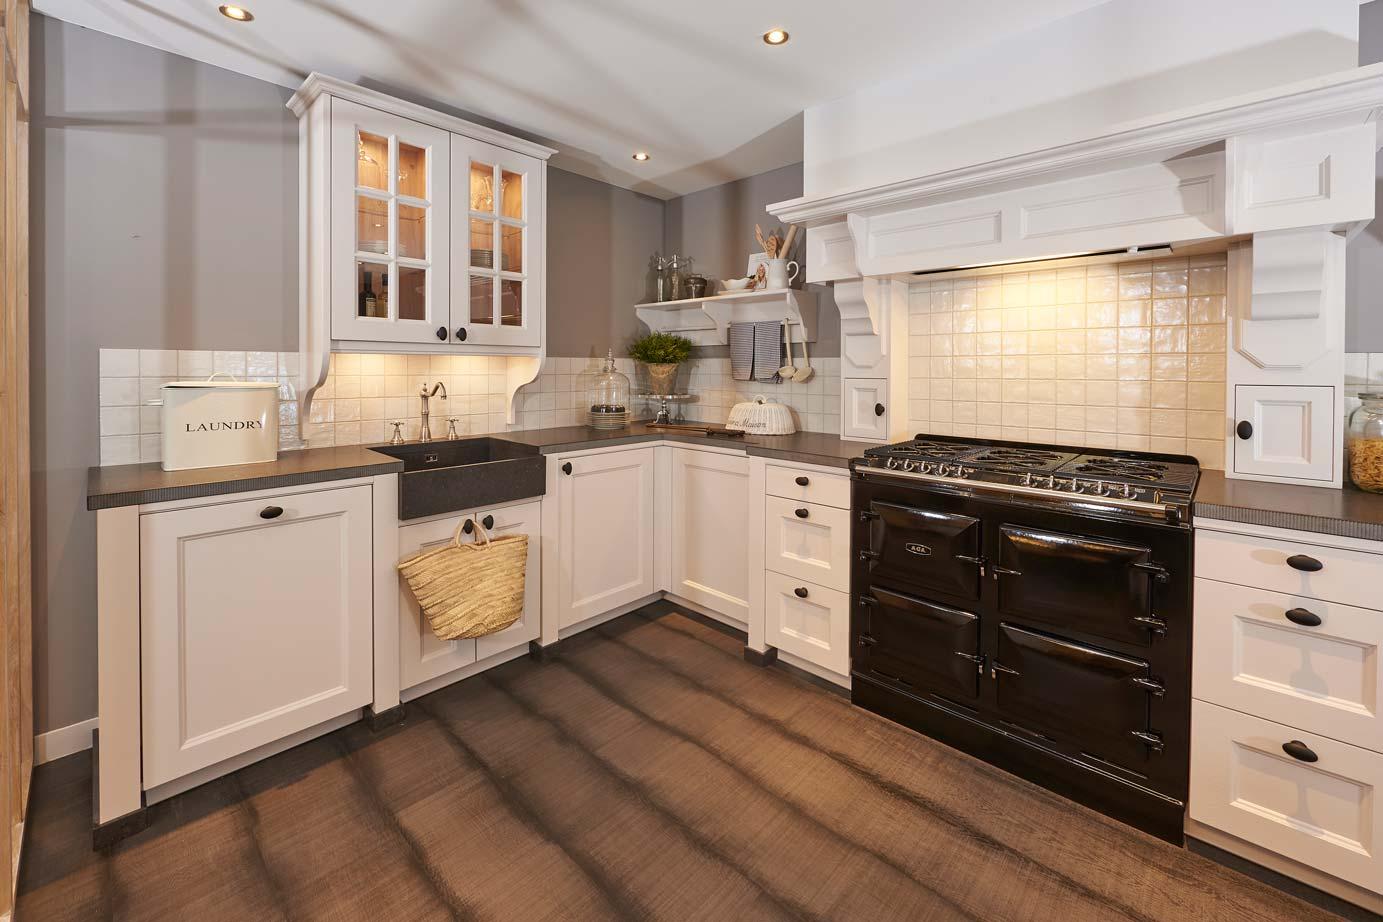 Goedkope Keuken Kastenwand : Landelijke Keukens Moderne Keukens Goedkope Keukens Meer Keukens Car